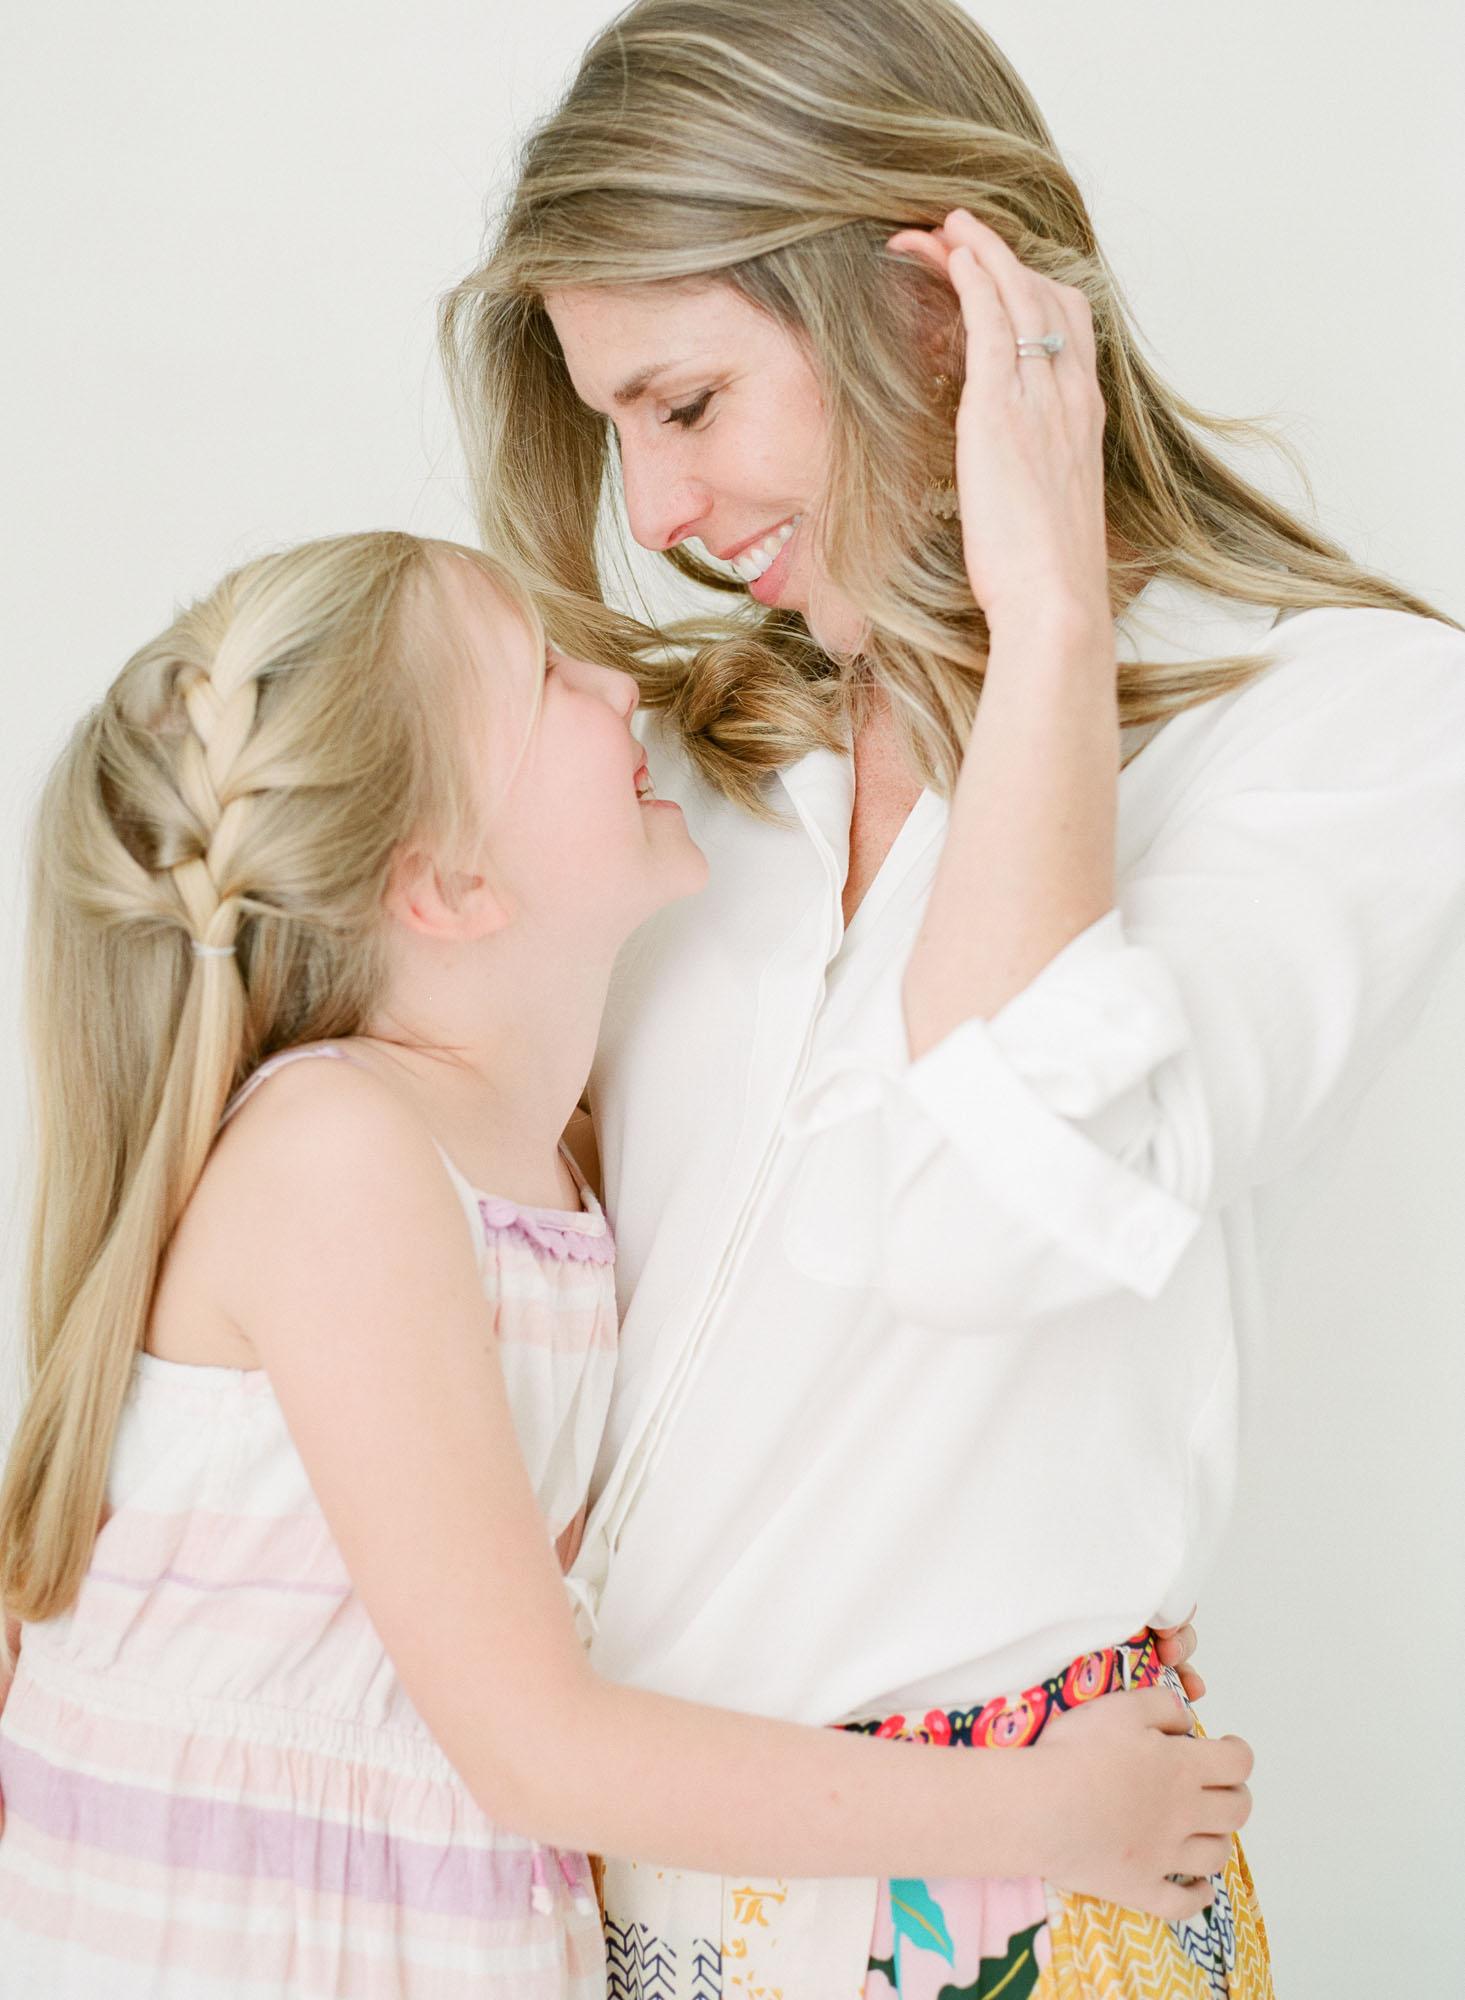 family-photographer-wake-forest-nc-motherhood-studio-portraits-003